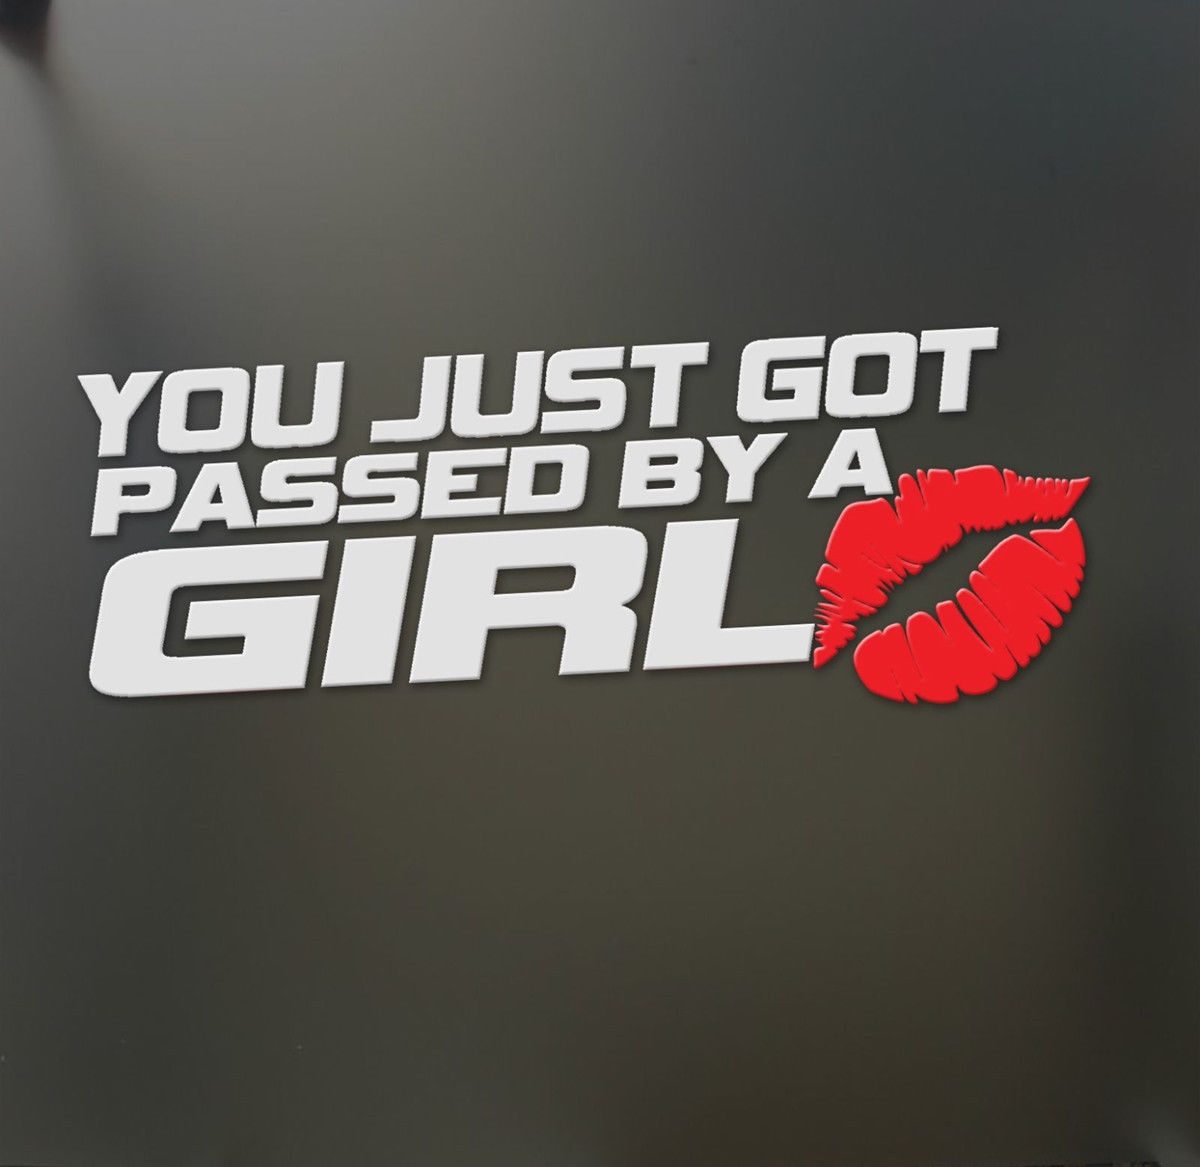 Car pass sticker design - You Just Got Passed By A Girl Kiss Mark Lip Sexy Lipstick Decal Vinyl Car Window Wall Home Sticker Halloween Xmas Decor Gift